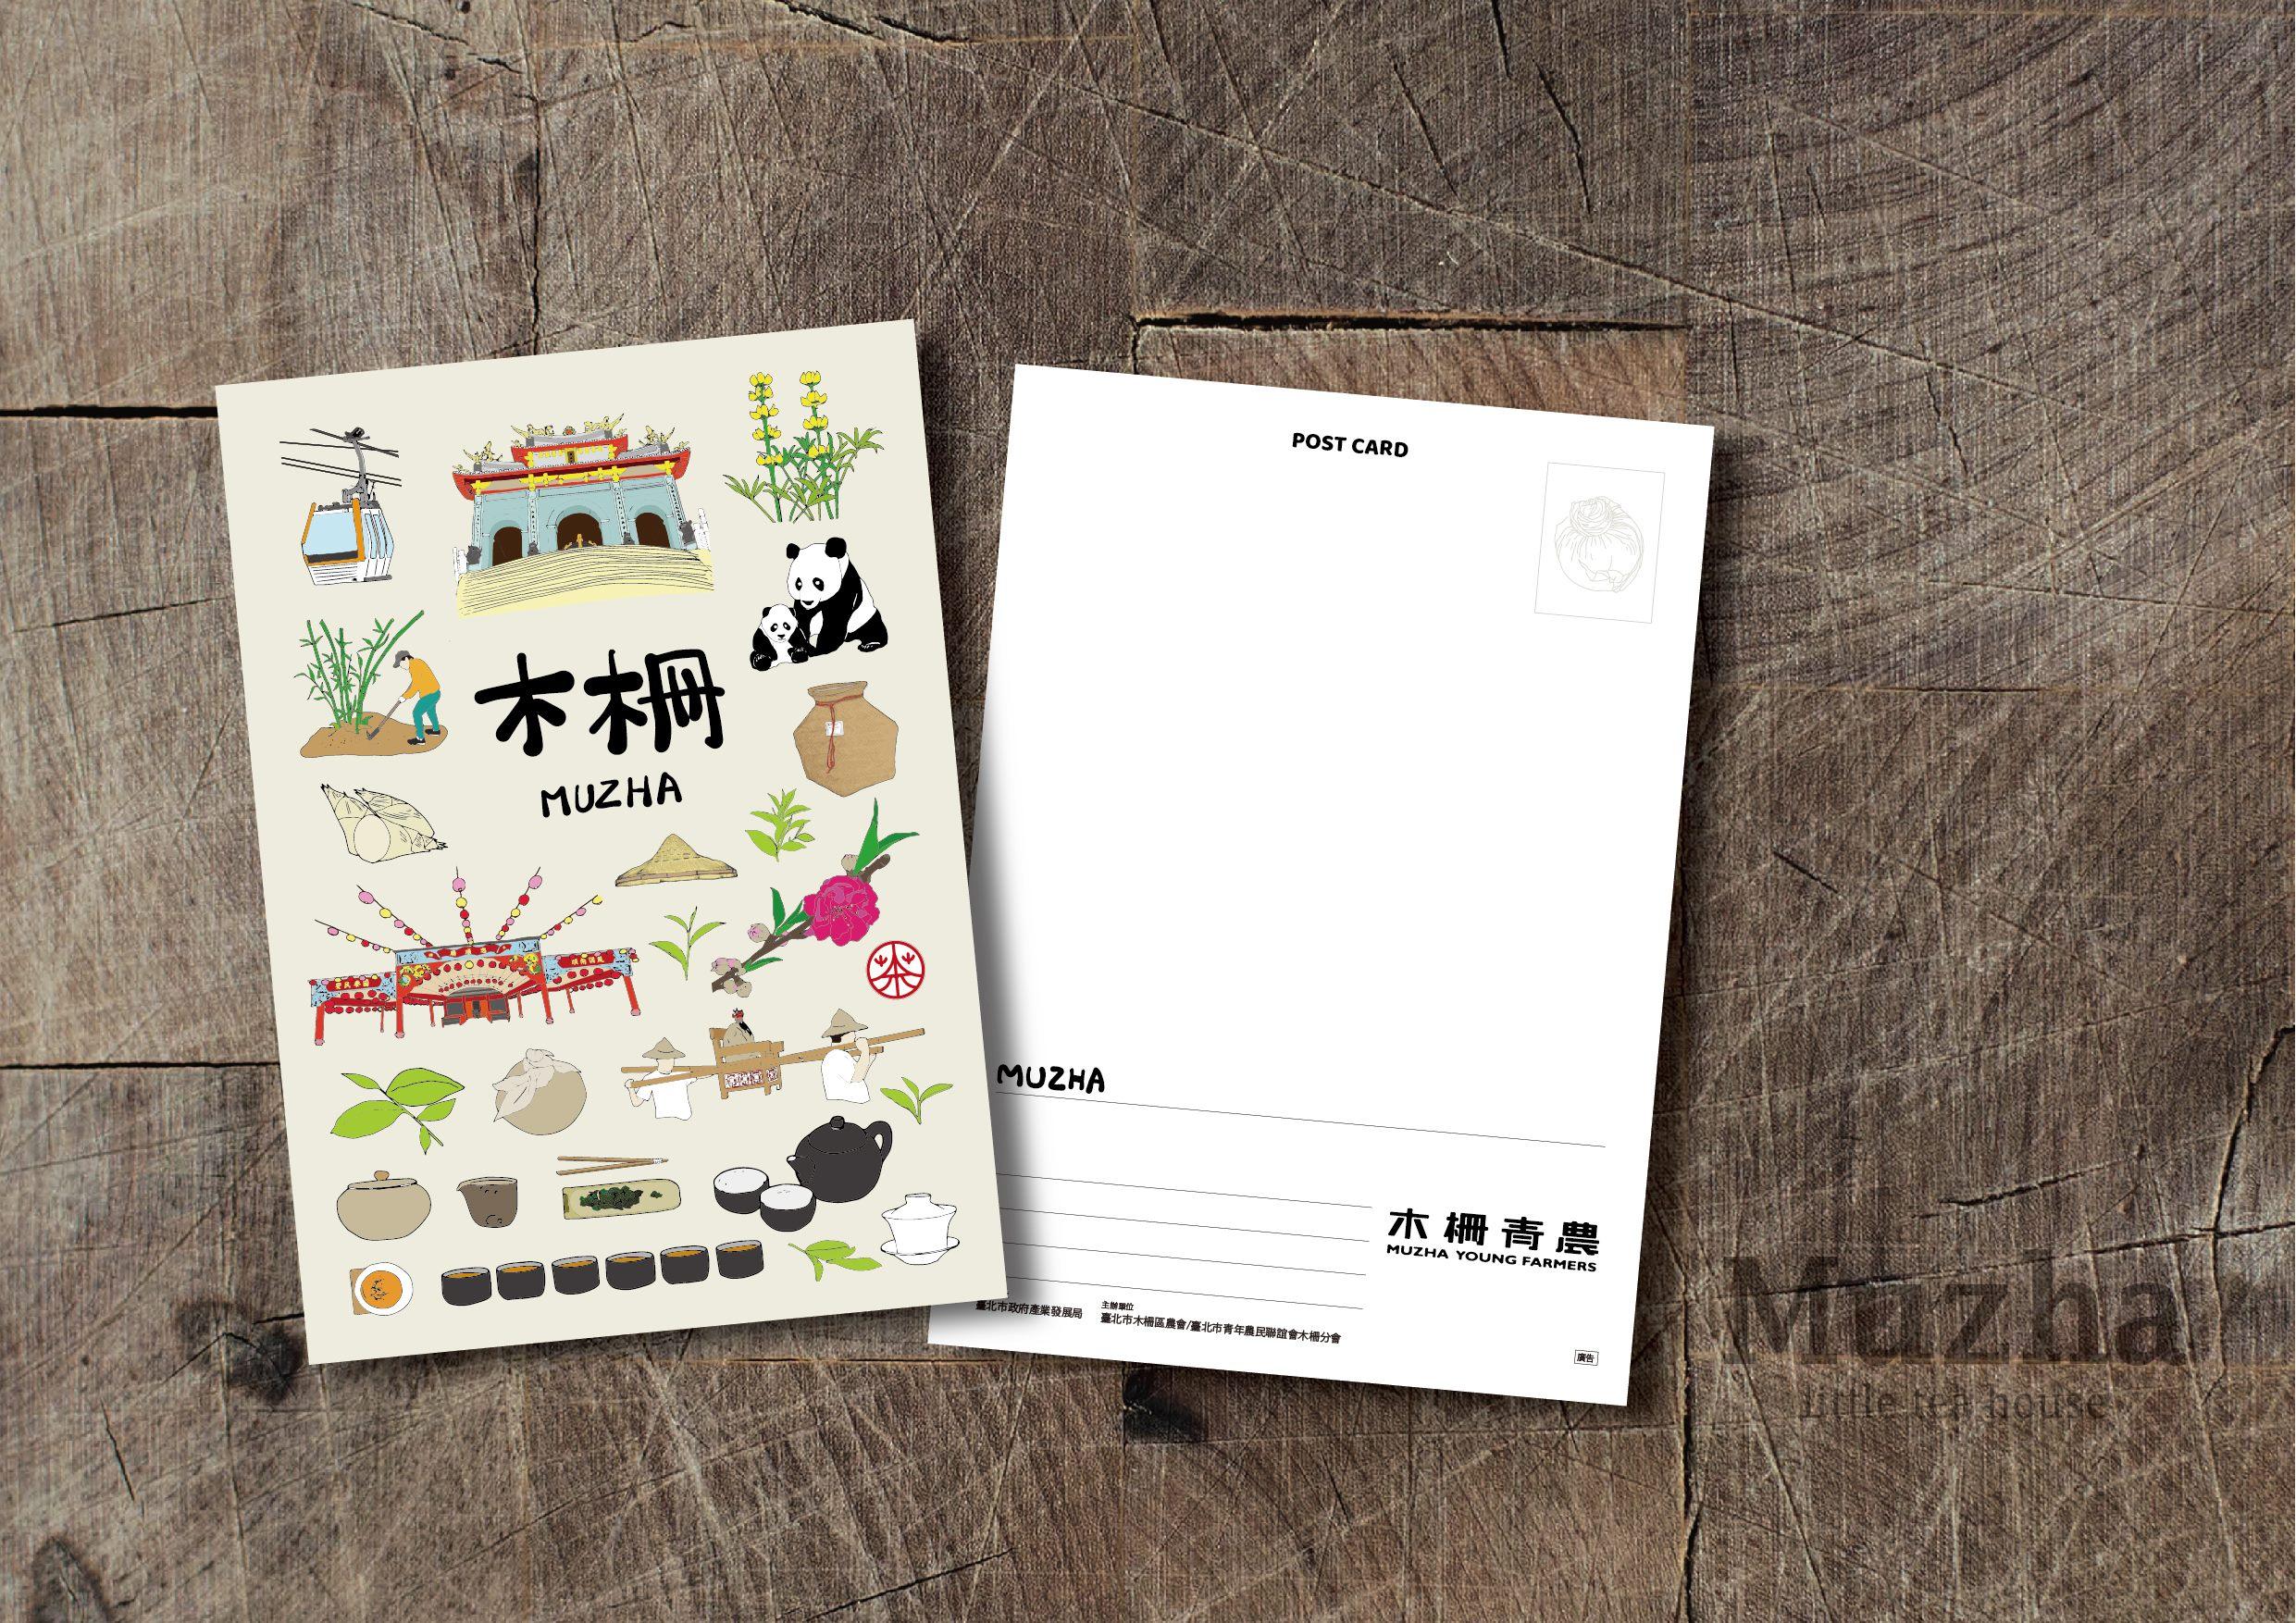 Muzha_Spots明信片,紀錄並呈現木柵各特色景點及茶區特色。